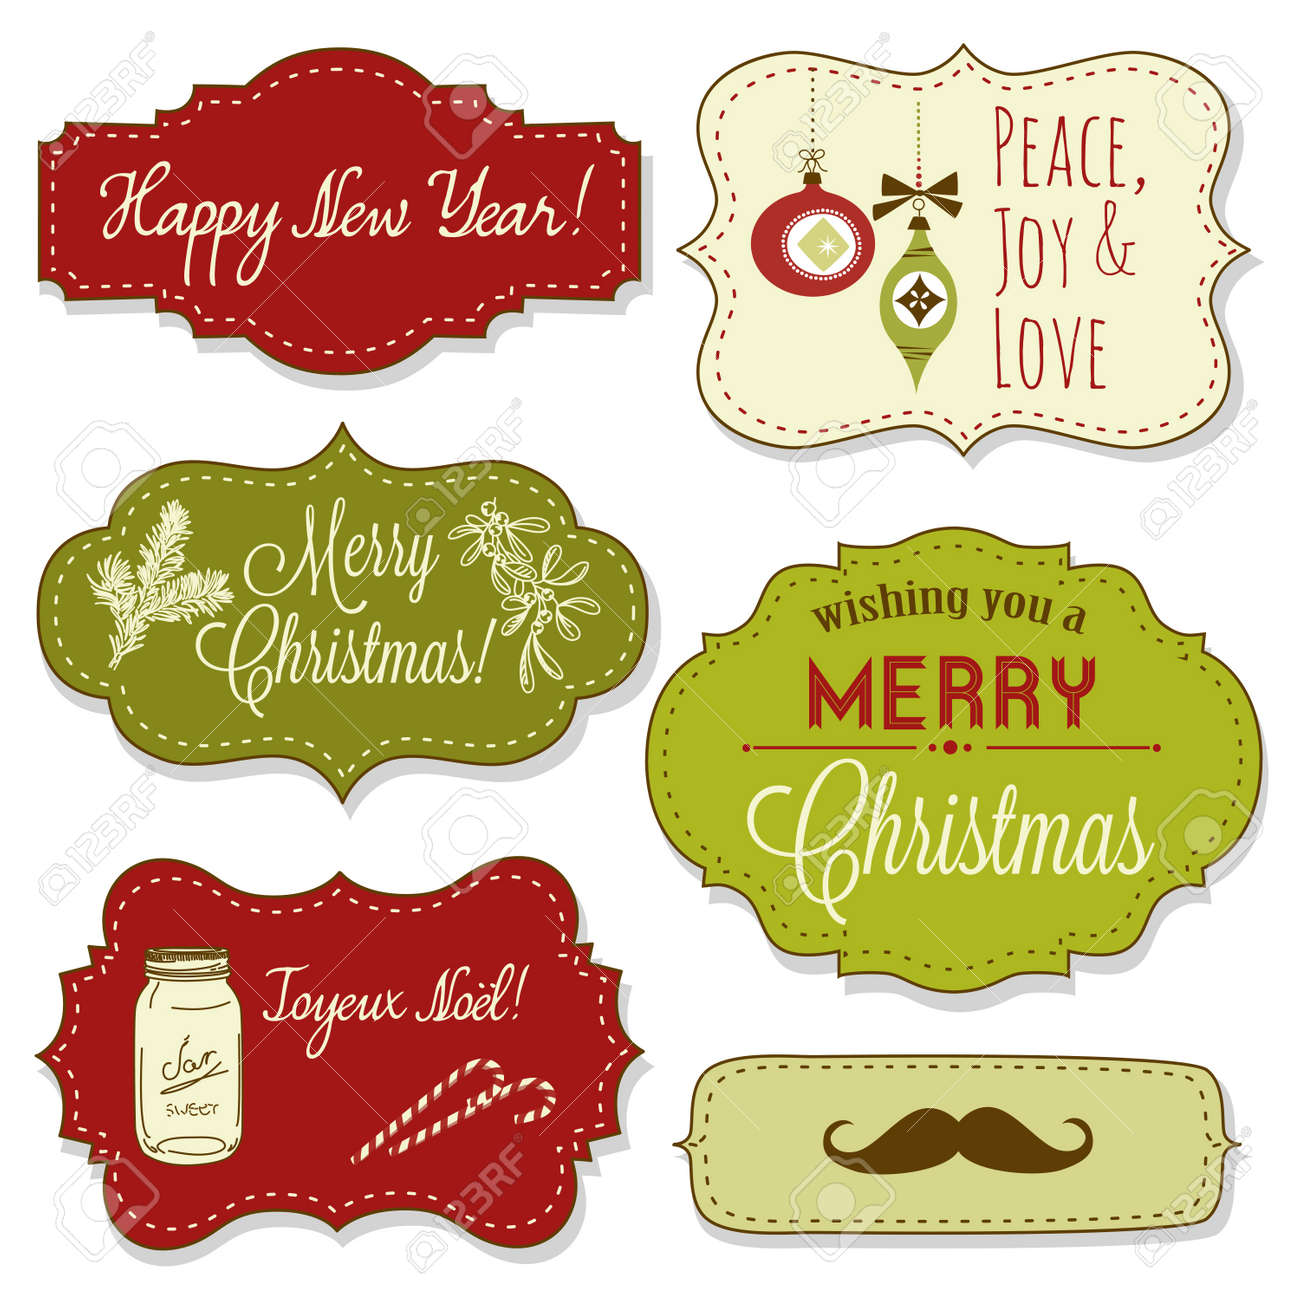 Vintage Christmas Frames Stock Vector - 16681008